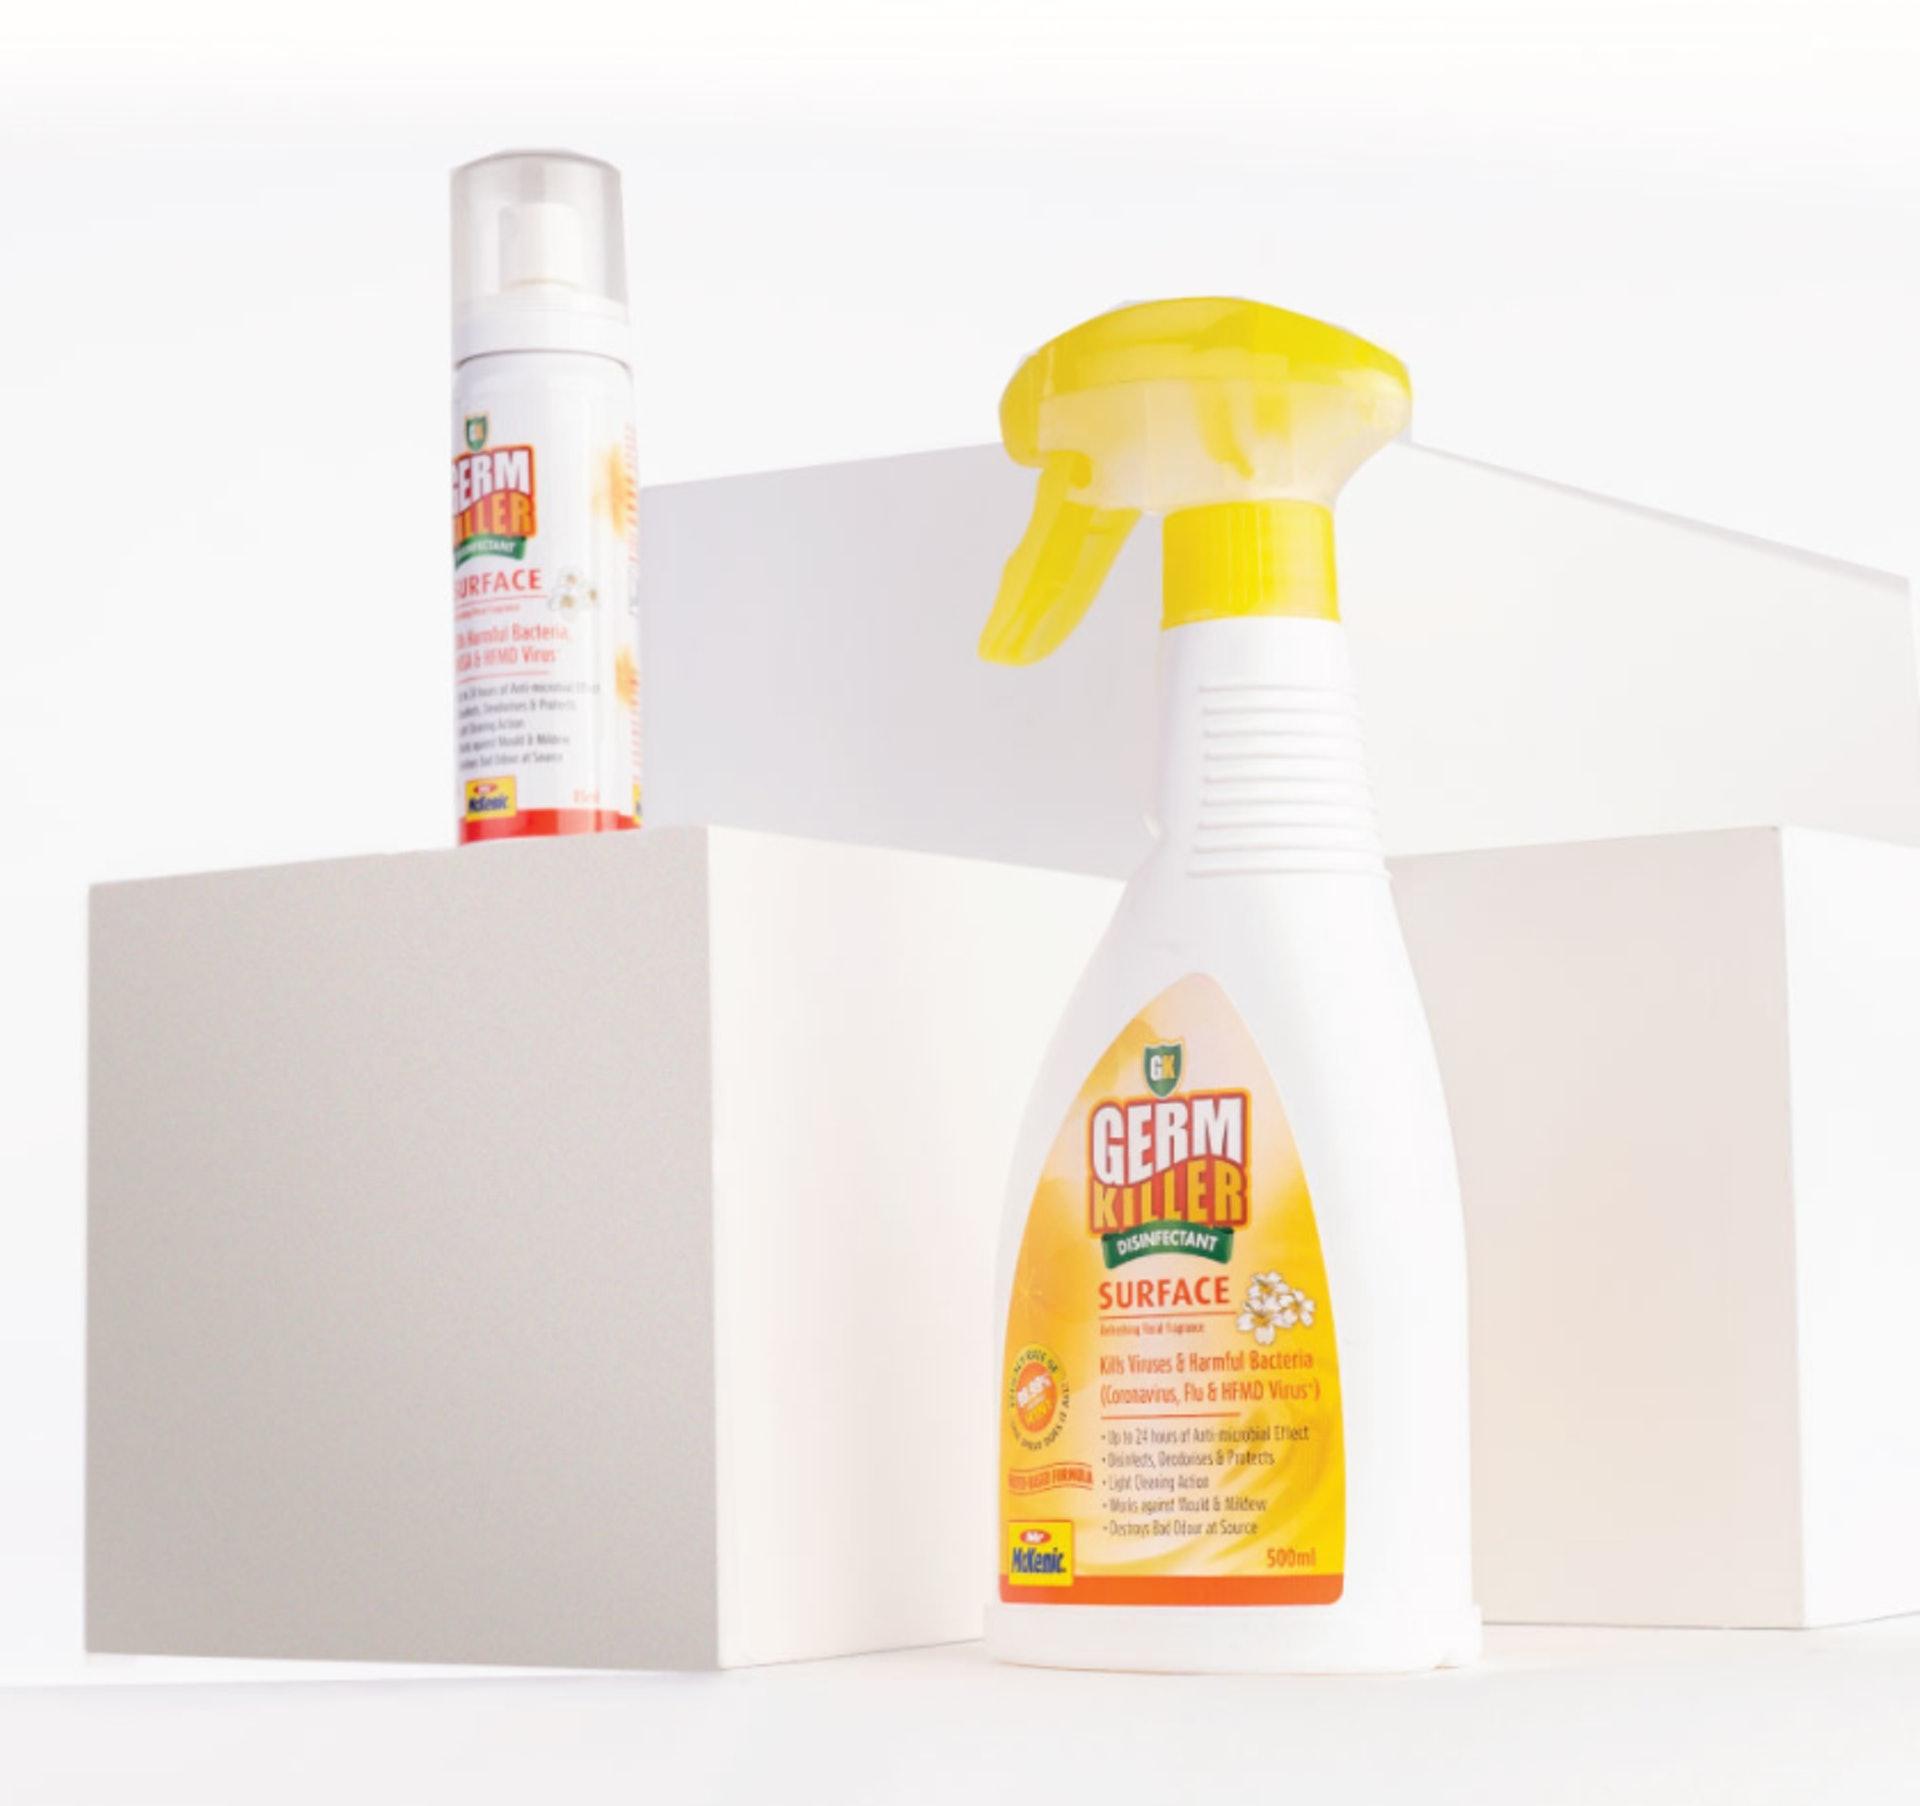 GK殺菌清潔噴霧 (黃色) 無須稀釋,只須短短1分鐘,清潔及消毒一步到位。